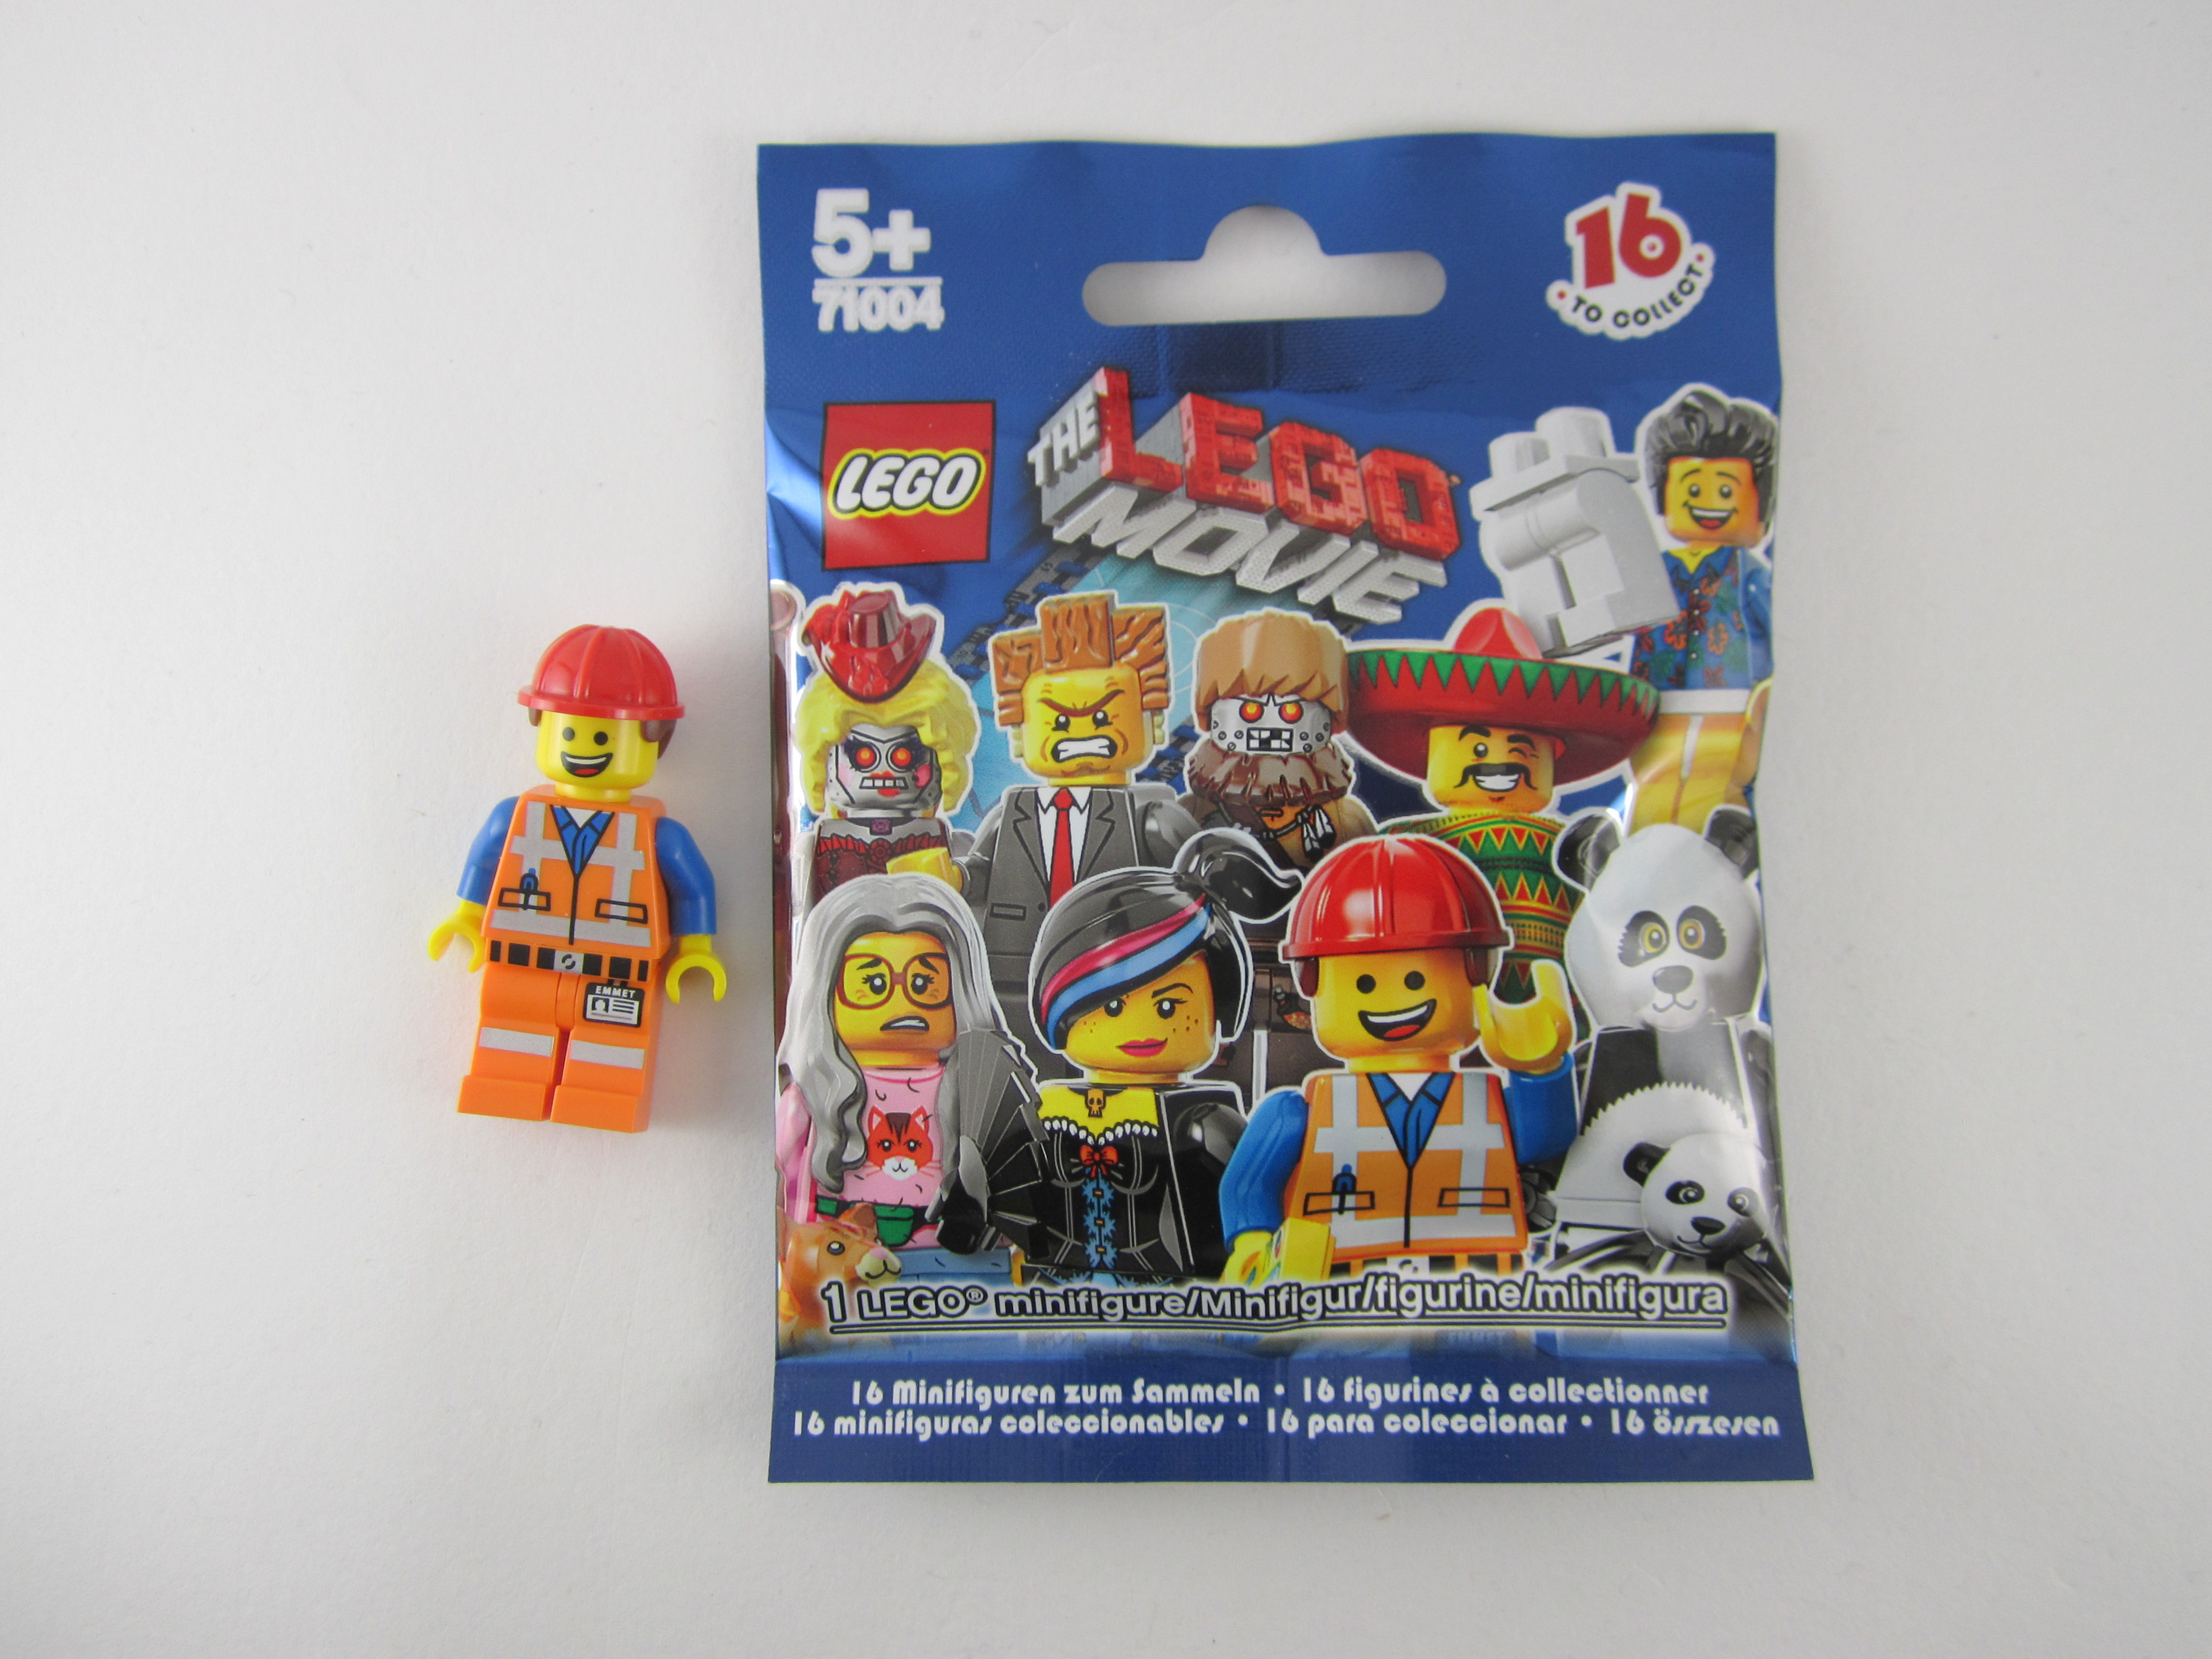 LEGO NEW REDDISH BROWN EMMETT THE MOVIE FIGURE MINIFIGURE MESSY HAIR PIECES